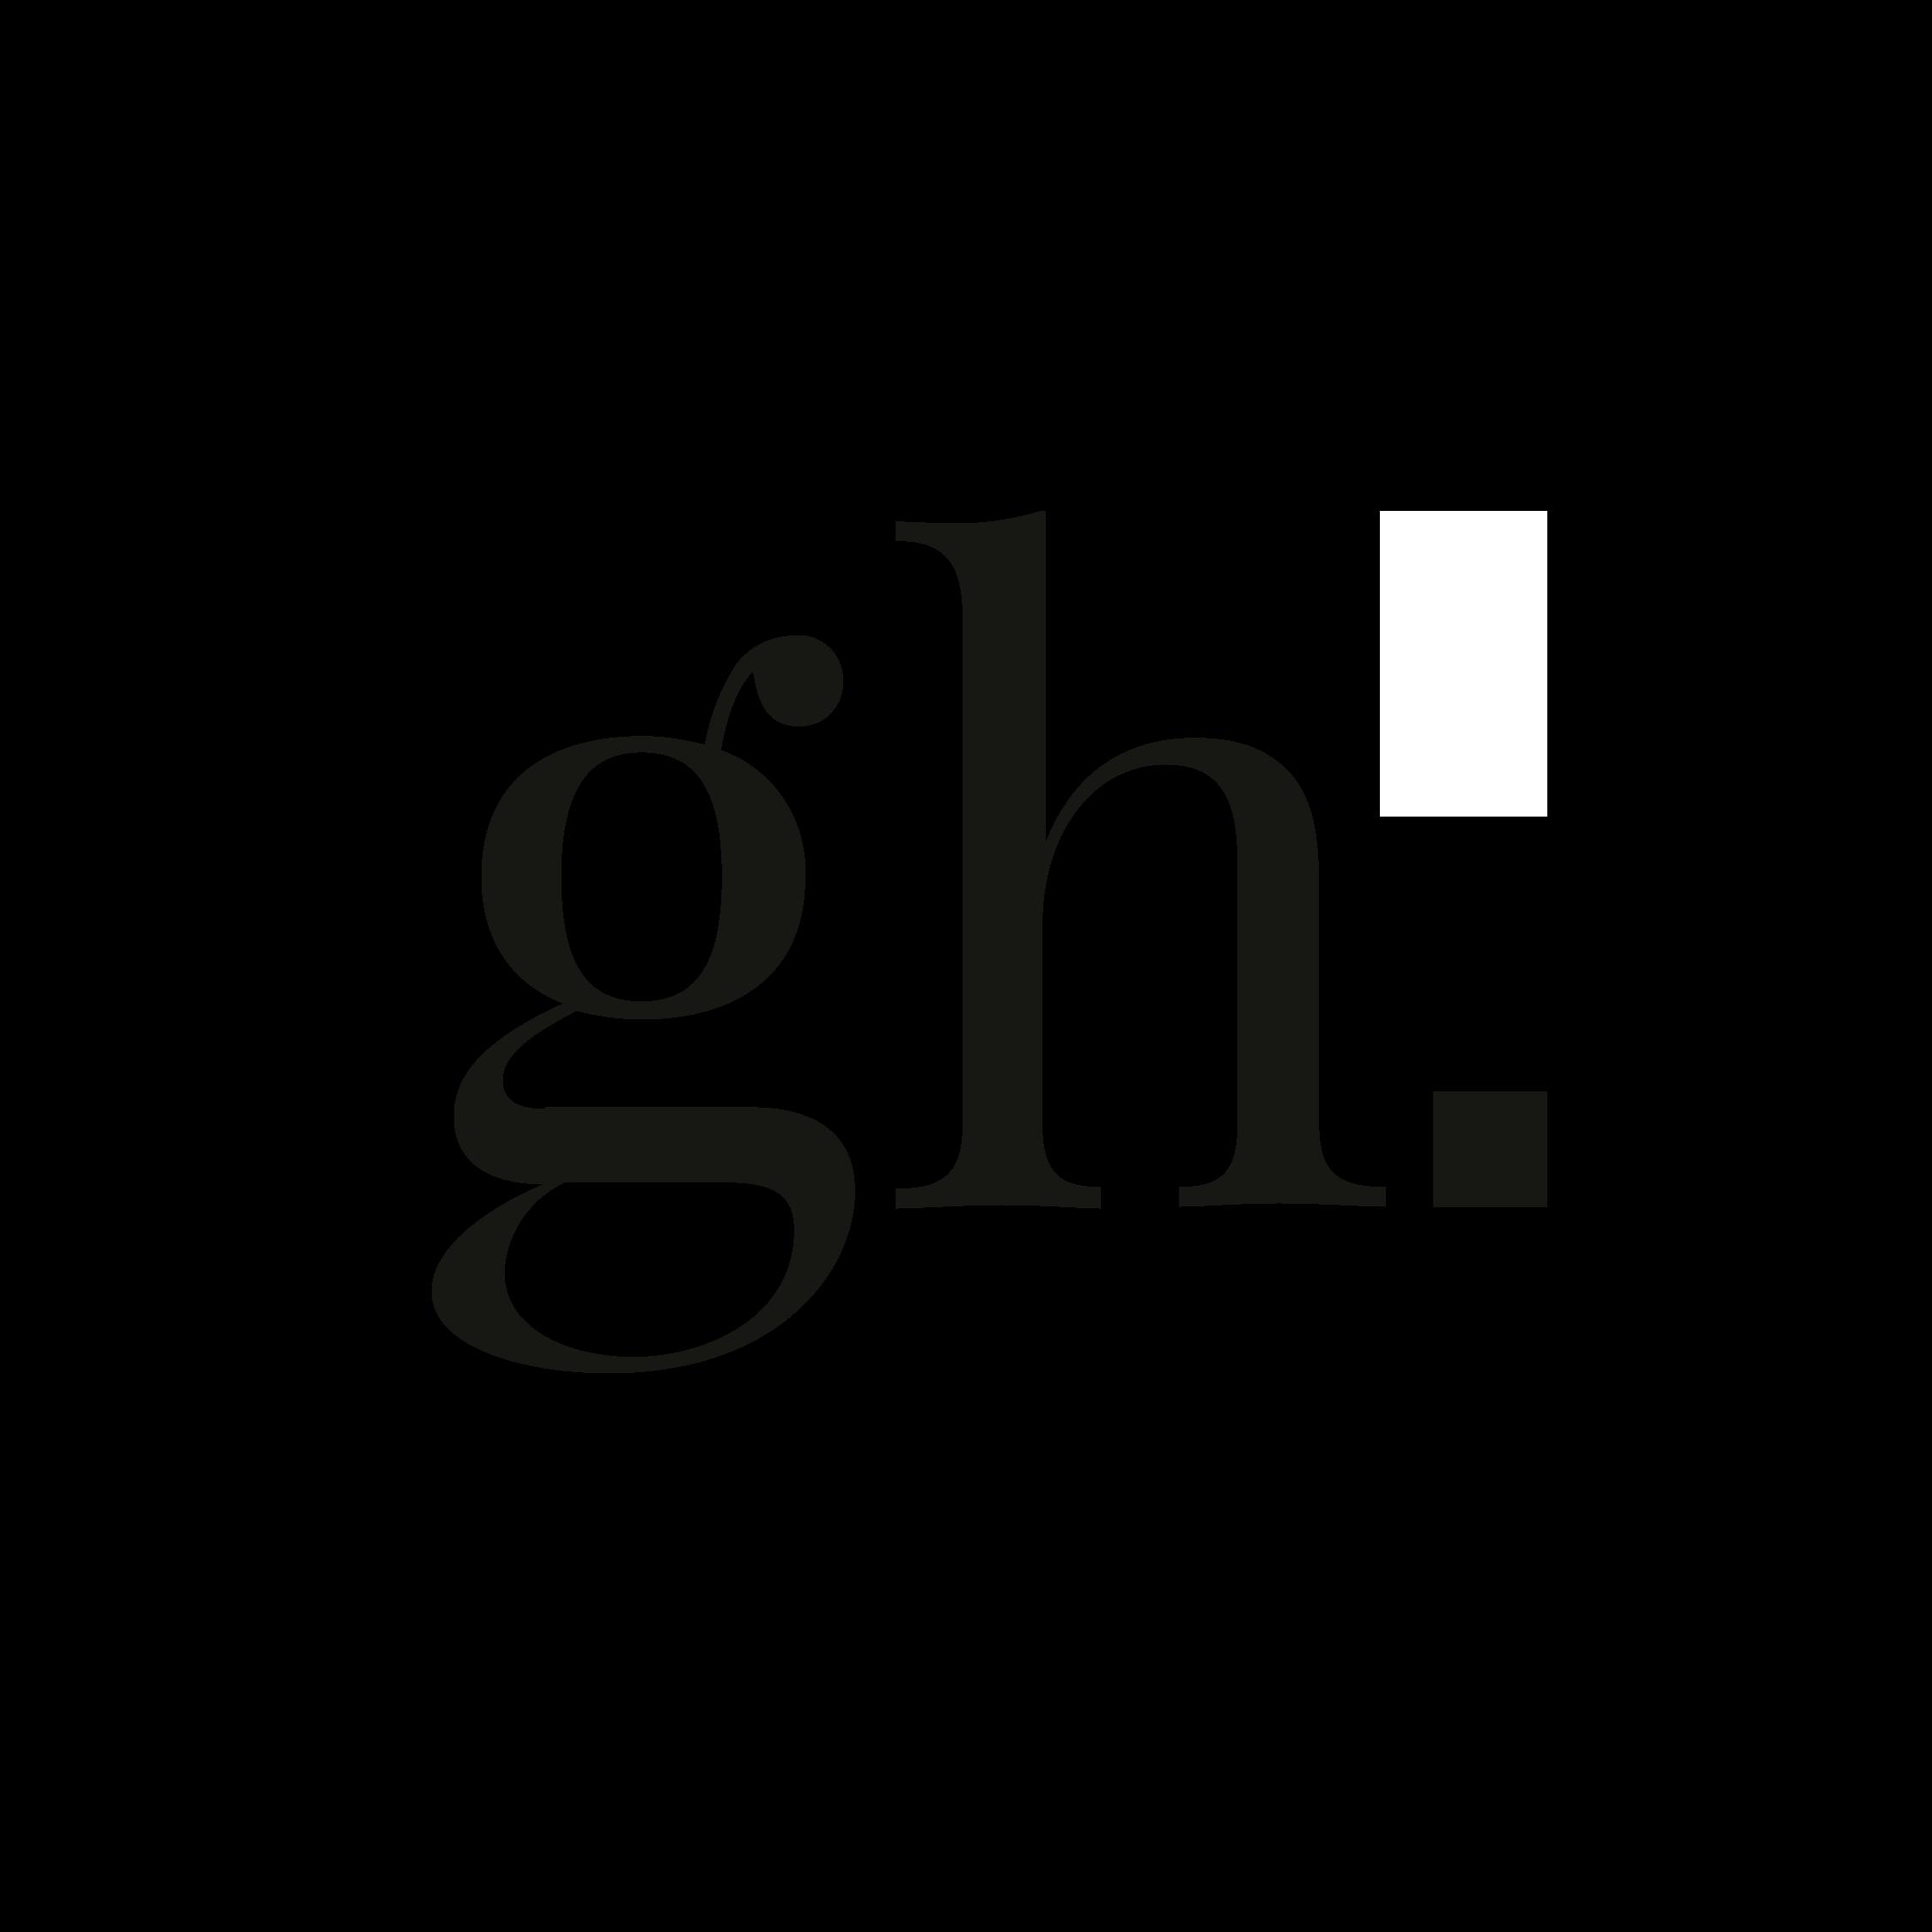 GEMA HERRERÍAS GH